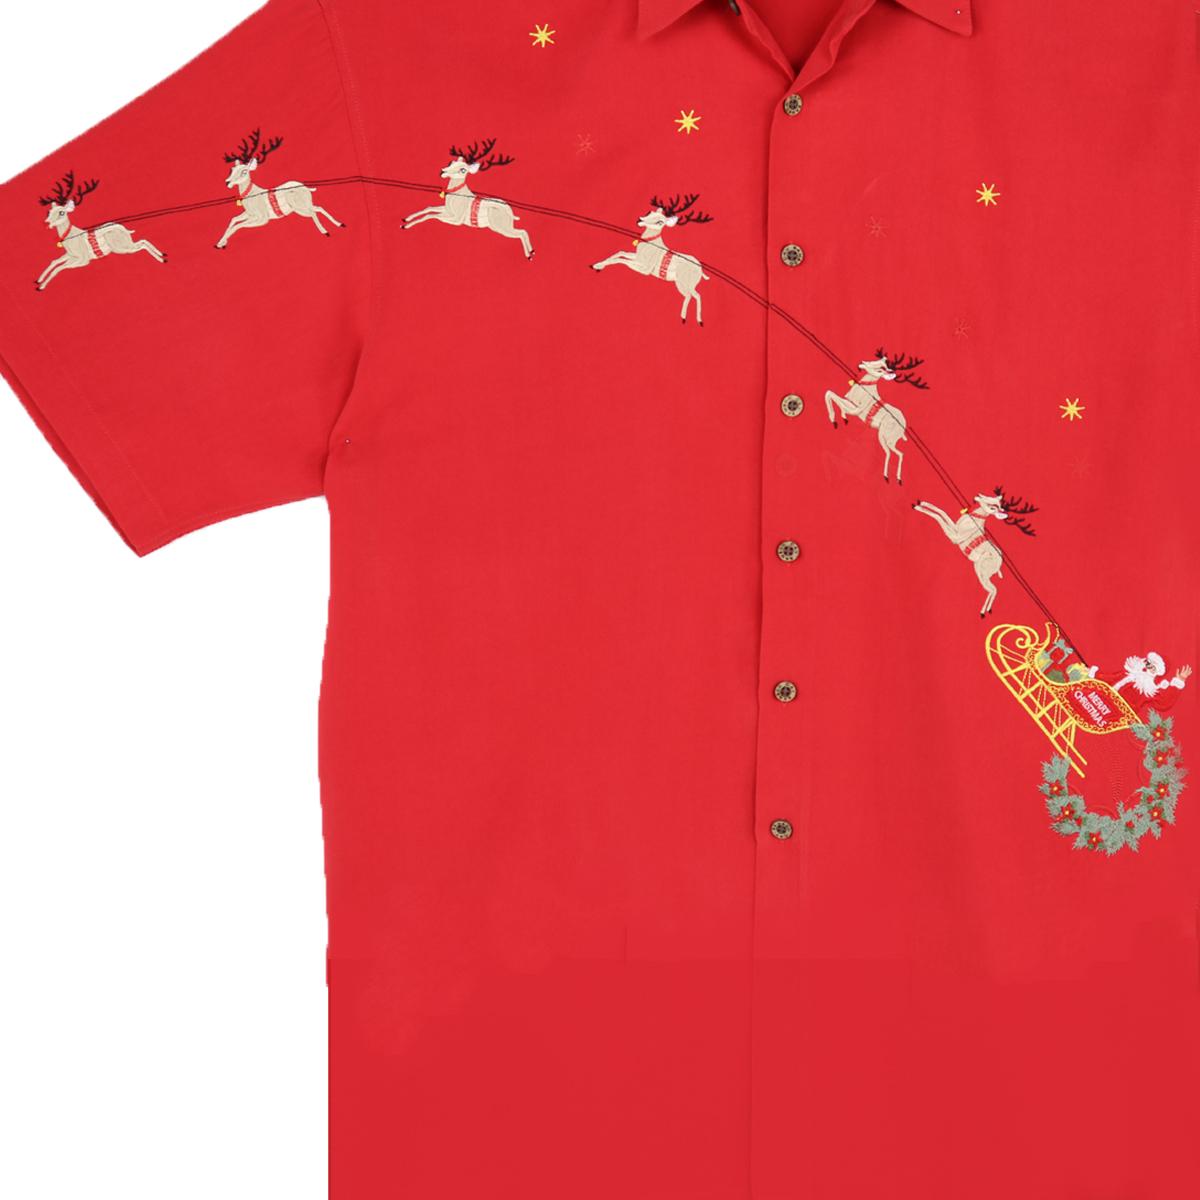 Bamboo Cay Men's Shirt – Flying Santa – Tomato – front WHOLE CLOSE UP